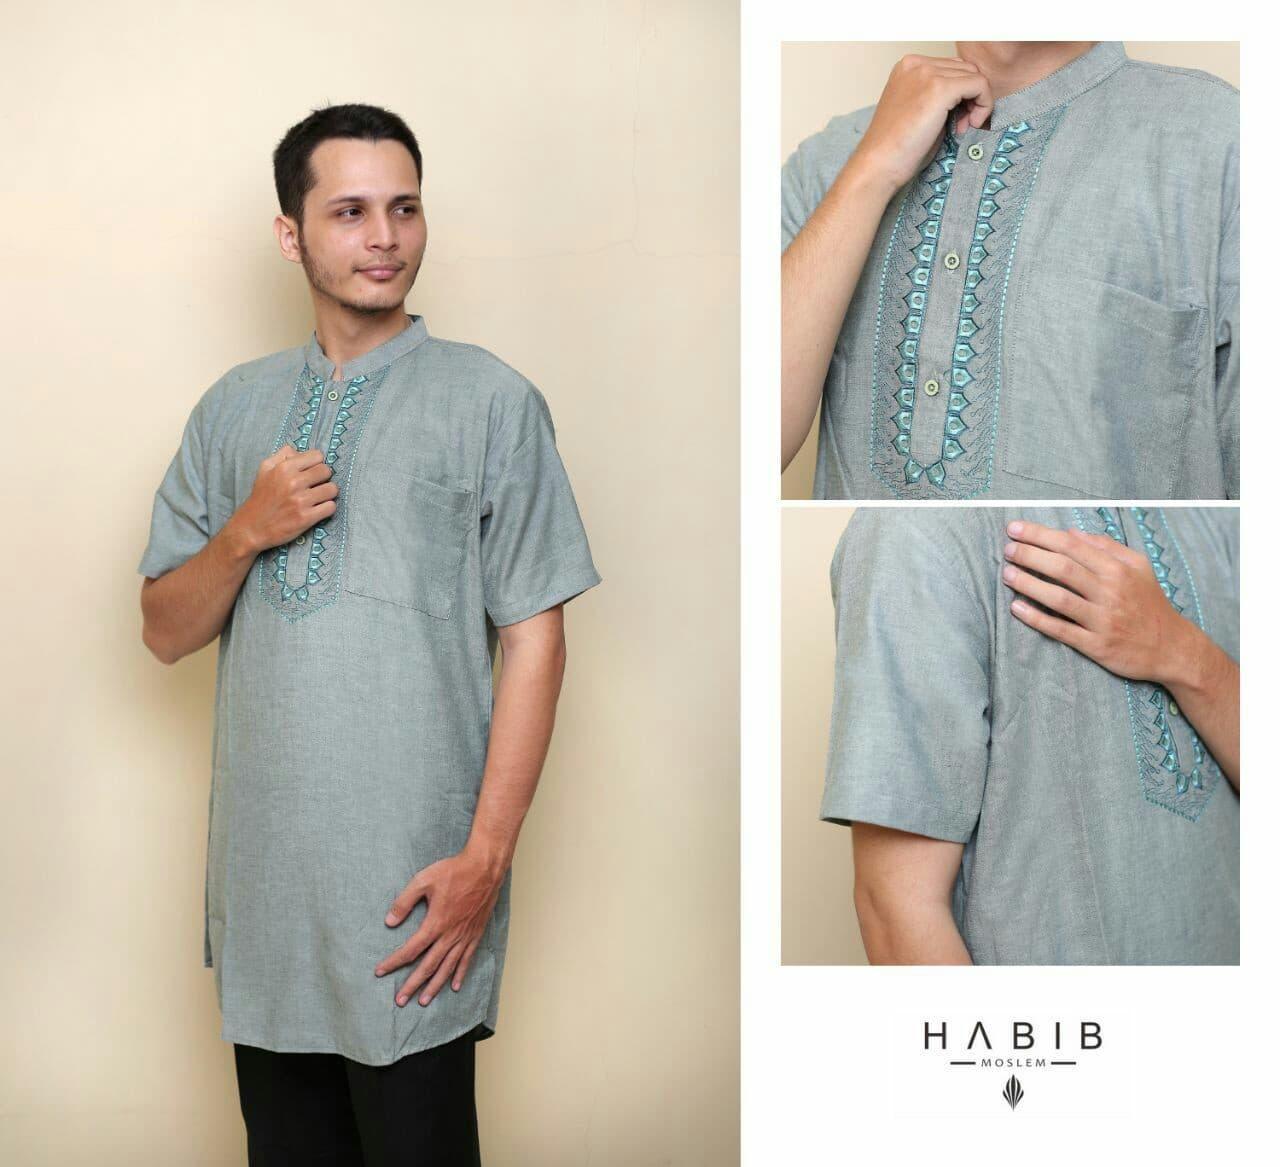 Baju Pria Kemeja Baju Koko Gaul Habib Pendek Hijau Muda